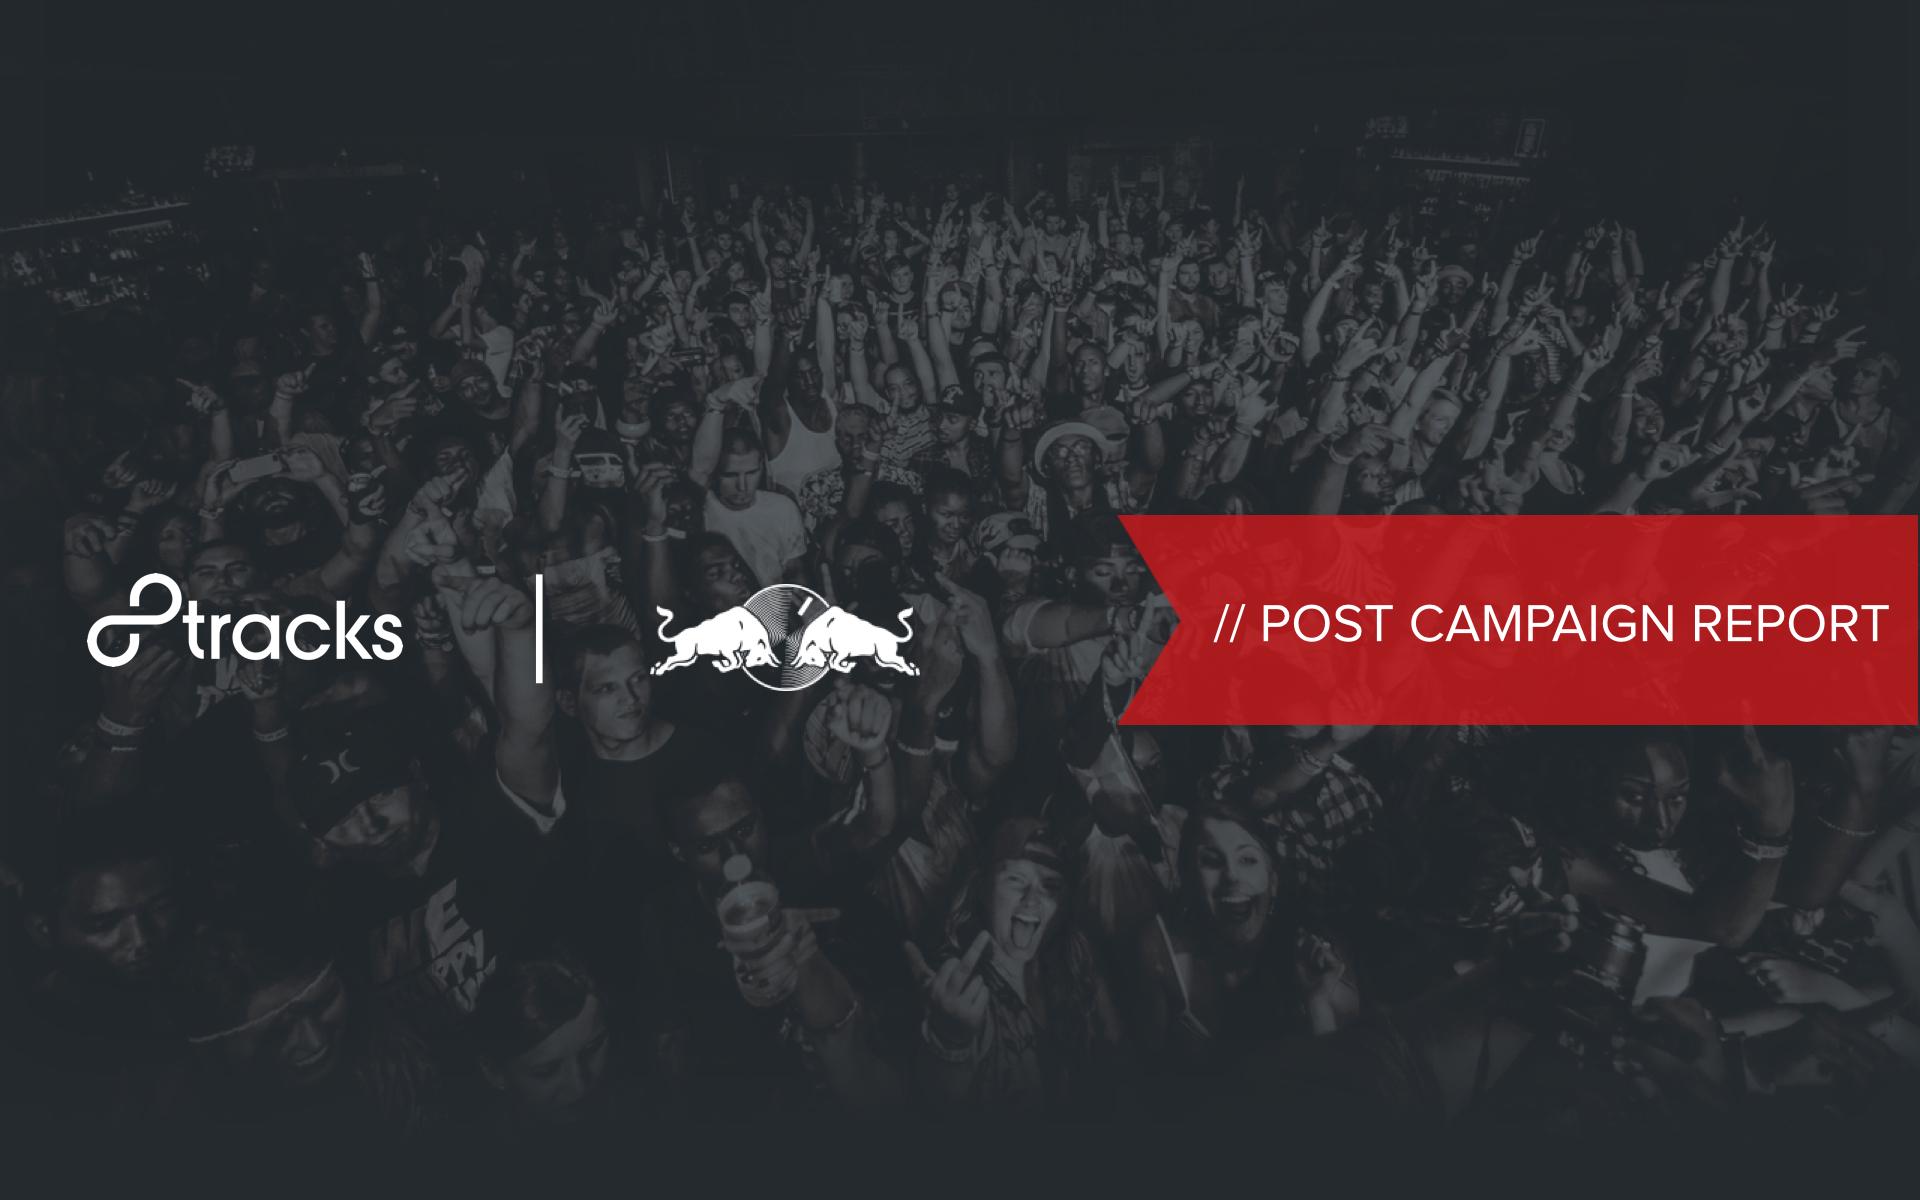 8tracks Campaign Reports   branding/identity, communication design, information design